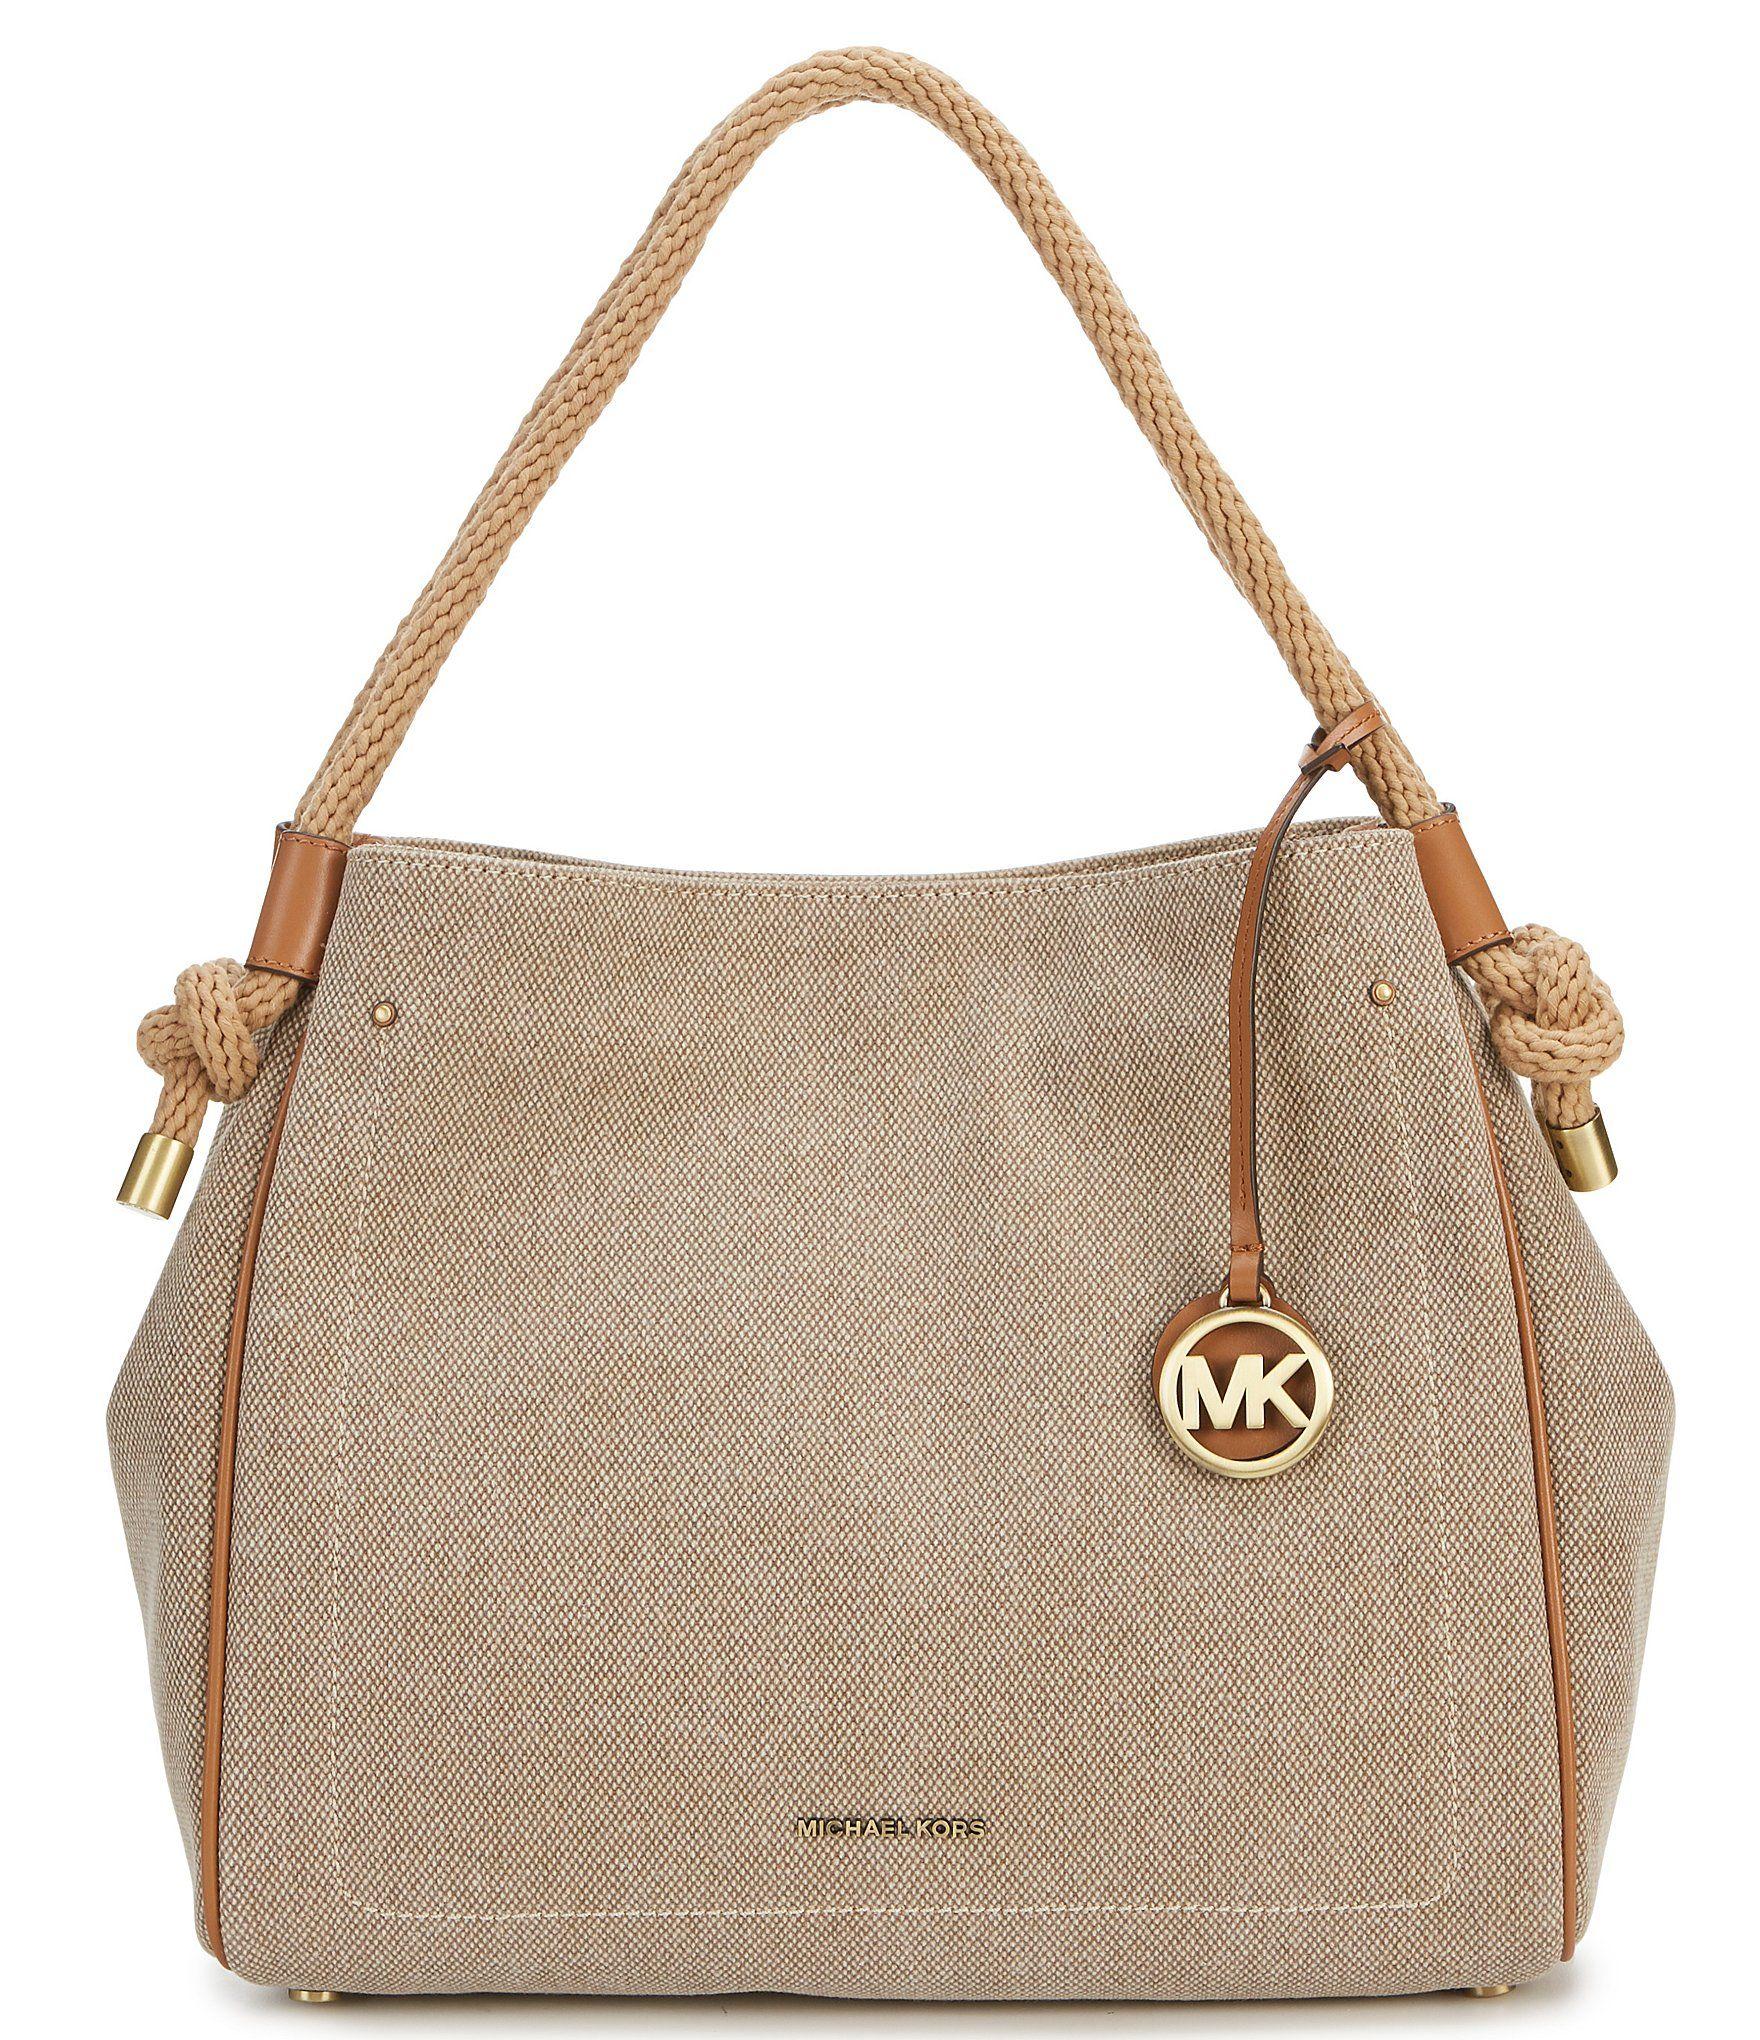 eac69d452ec4 Shop for MICHAEL Michael Kors Isla Large Washed Hemp Canvas Grab Bag at  Dillards.com. Visit Dillards.com to find clothing, accessories, shoes, ...